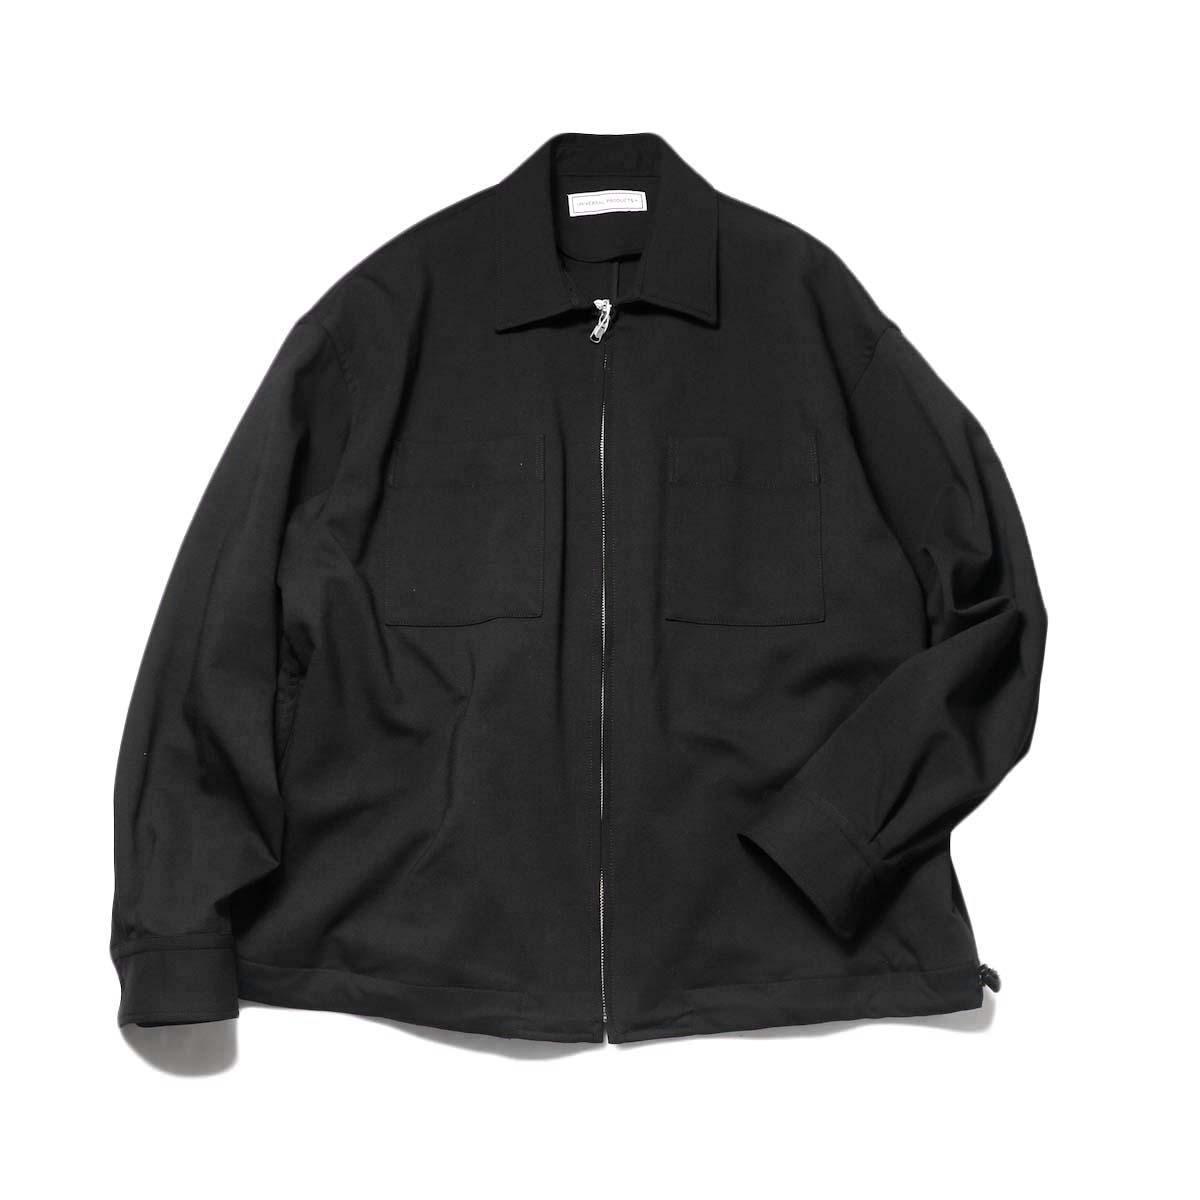 UNIVERSAL PRODUCTS / Double Cloth Zip Front Blouson (Black)